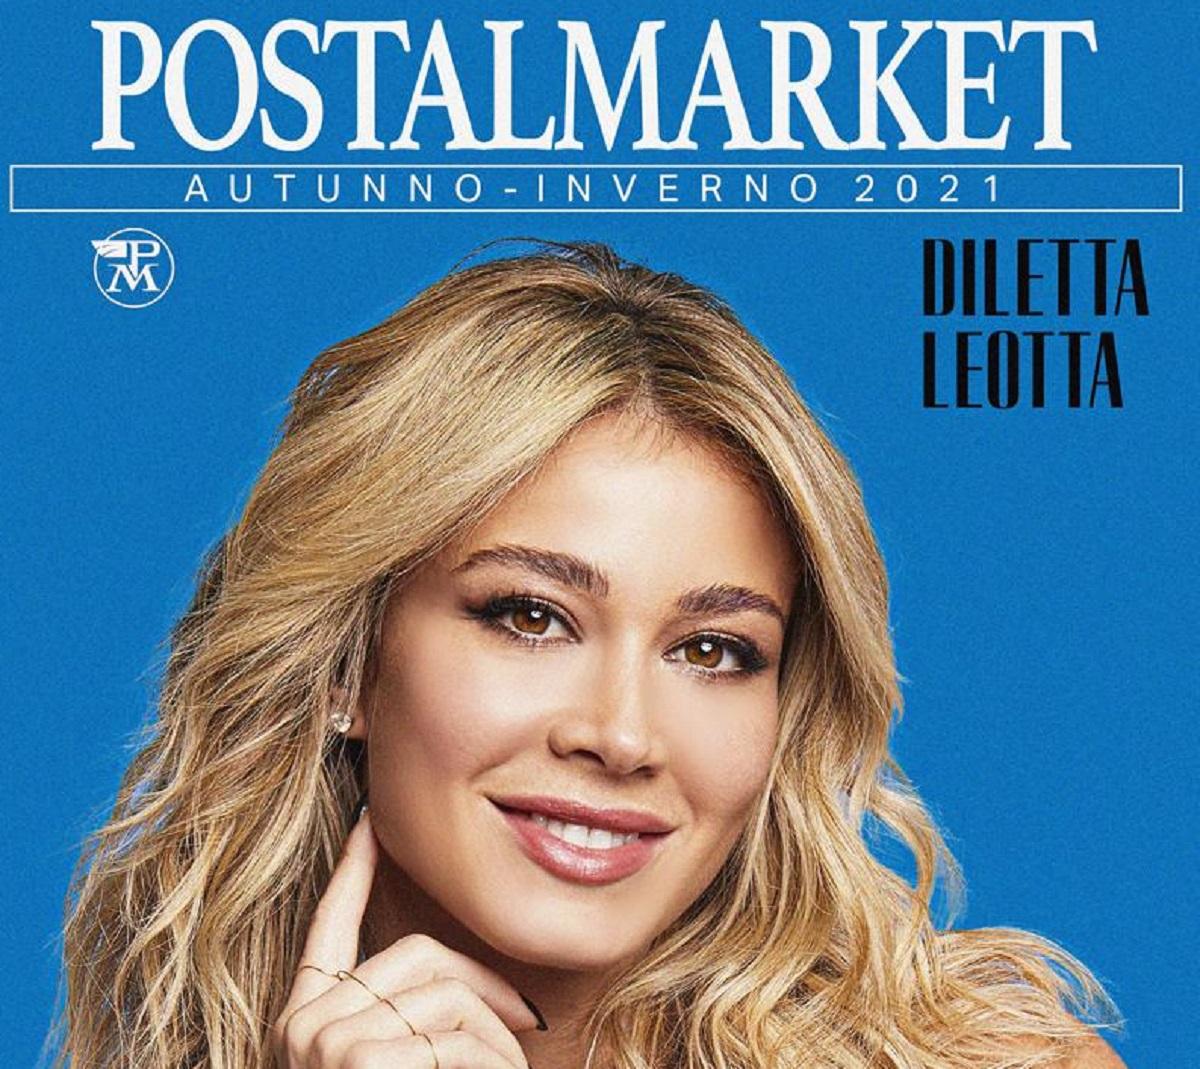 postalmarket diletta